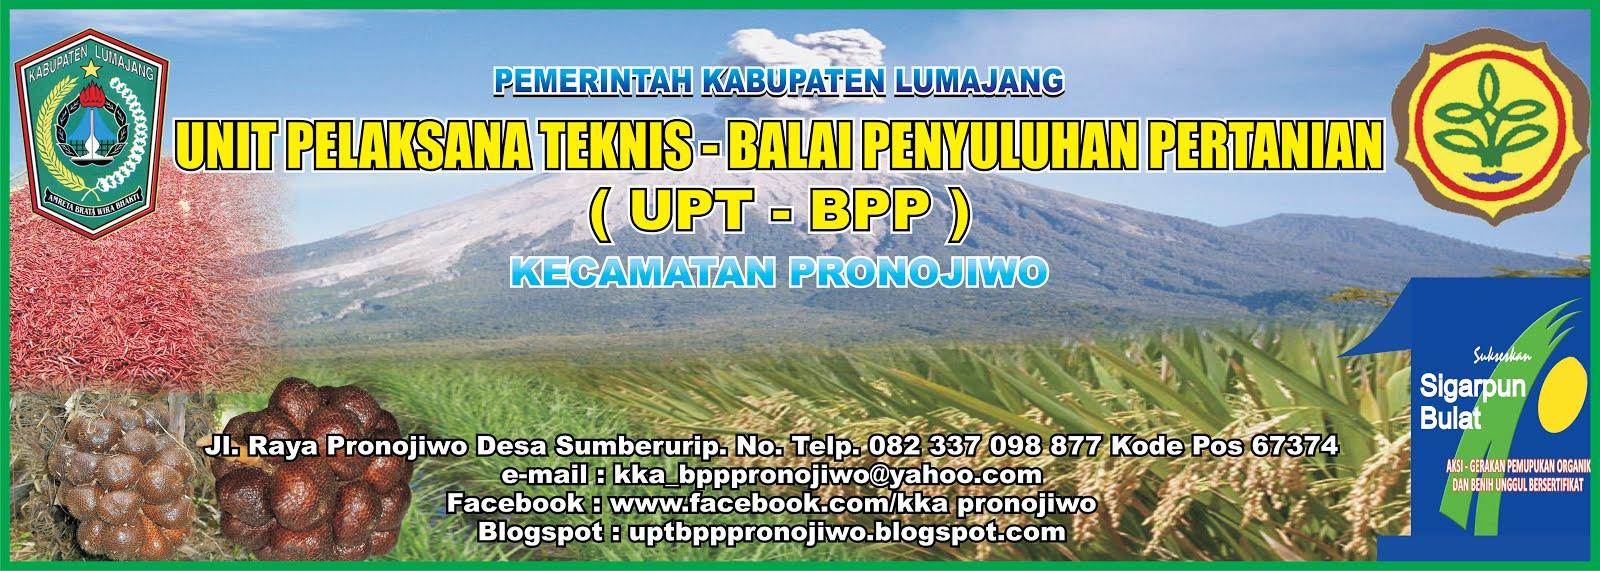 UPT-BPP PRONOJIWO